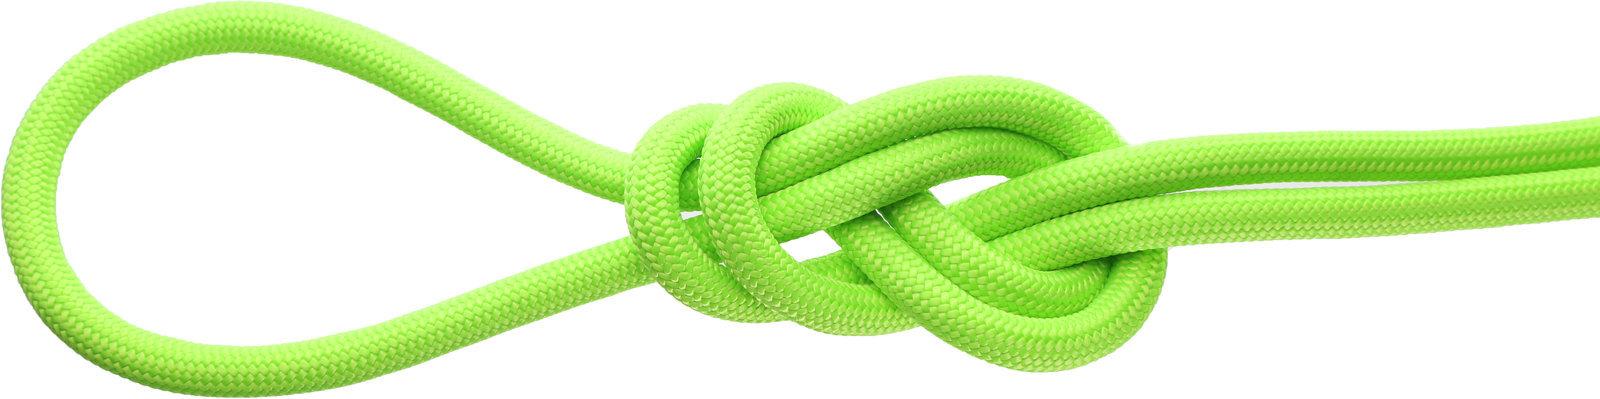 KM-III MAX TPT (Static Rope) Kernmantle - Polyester Sheath, Nylon Core